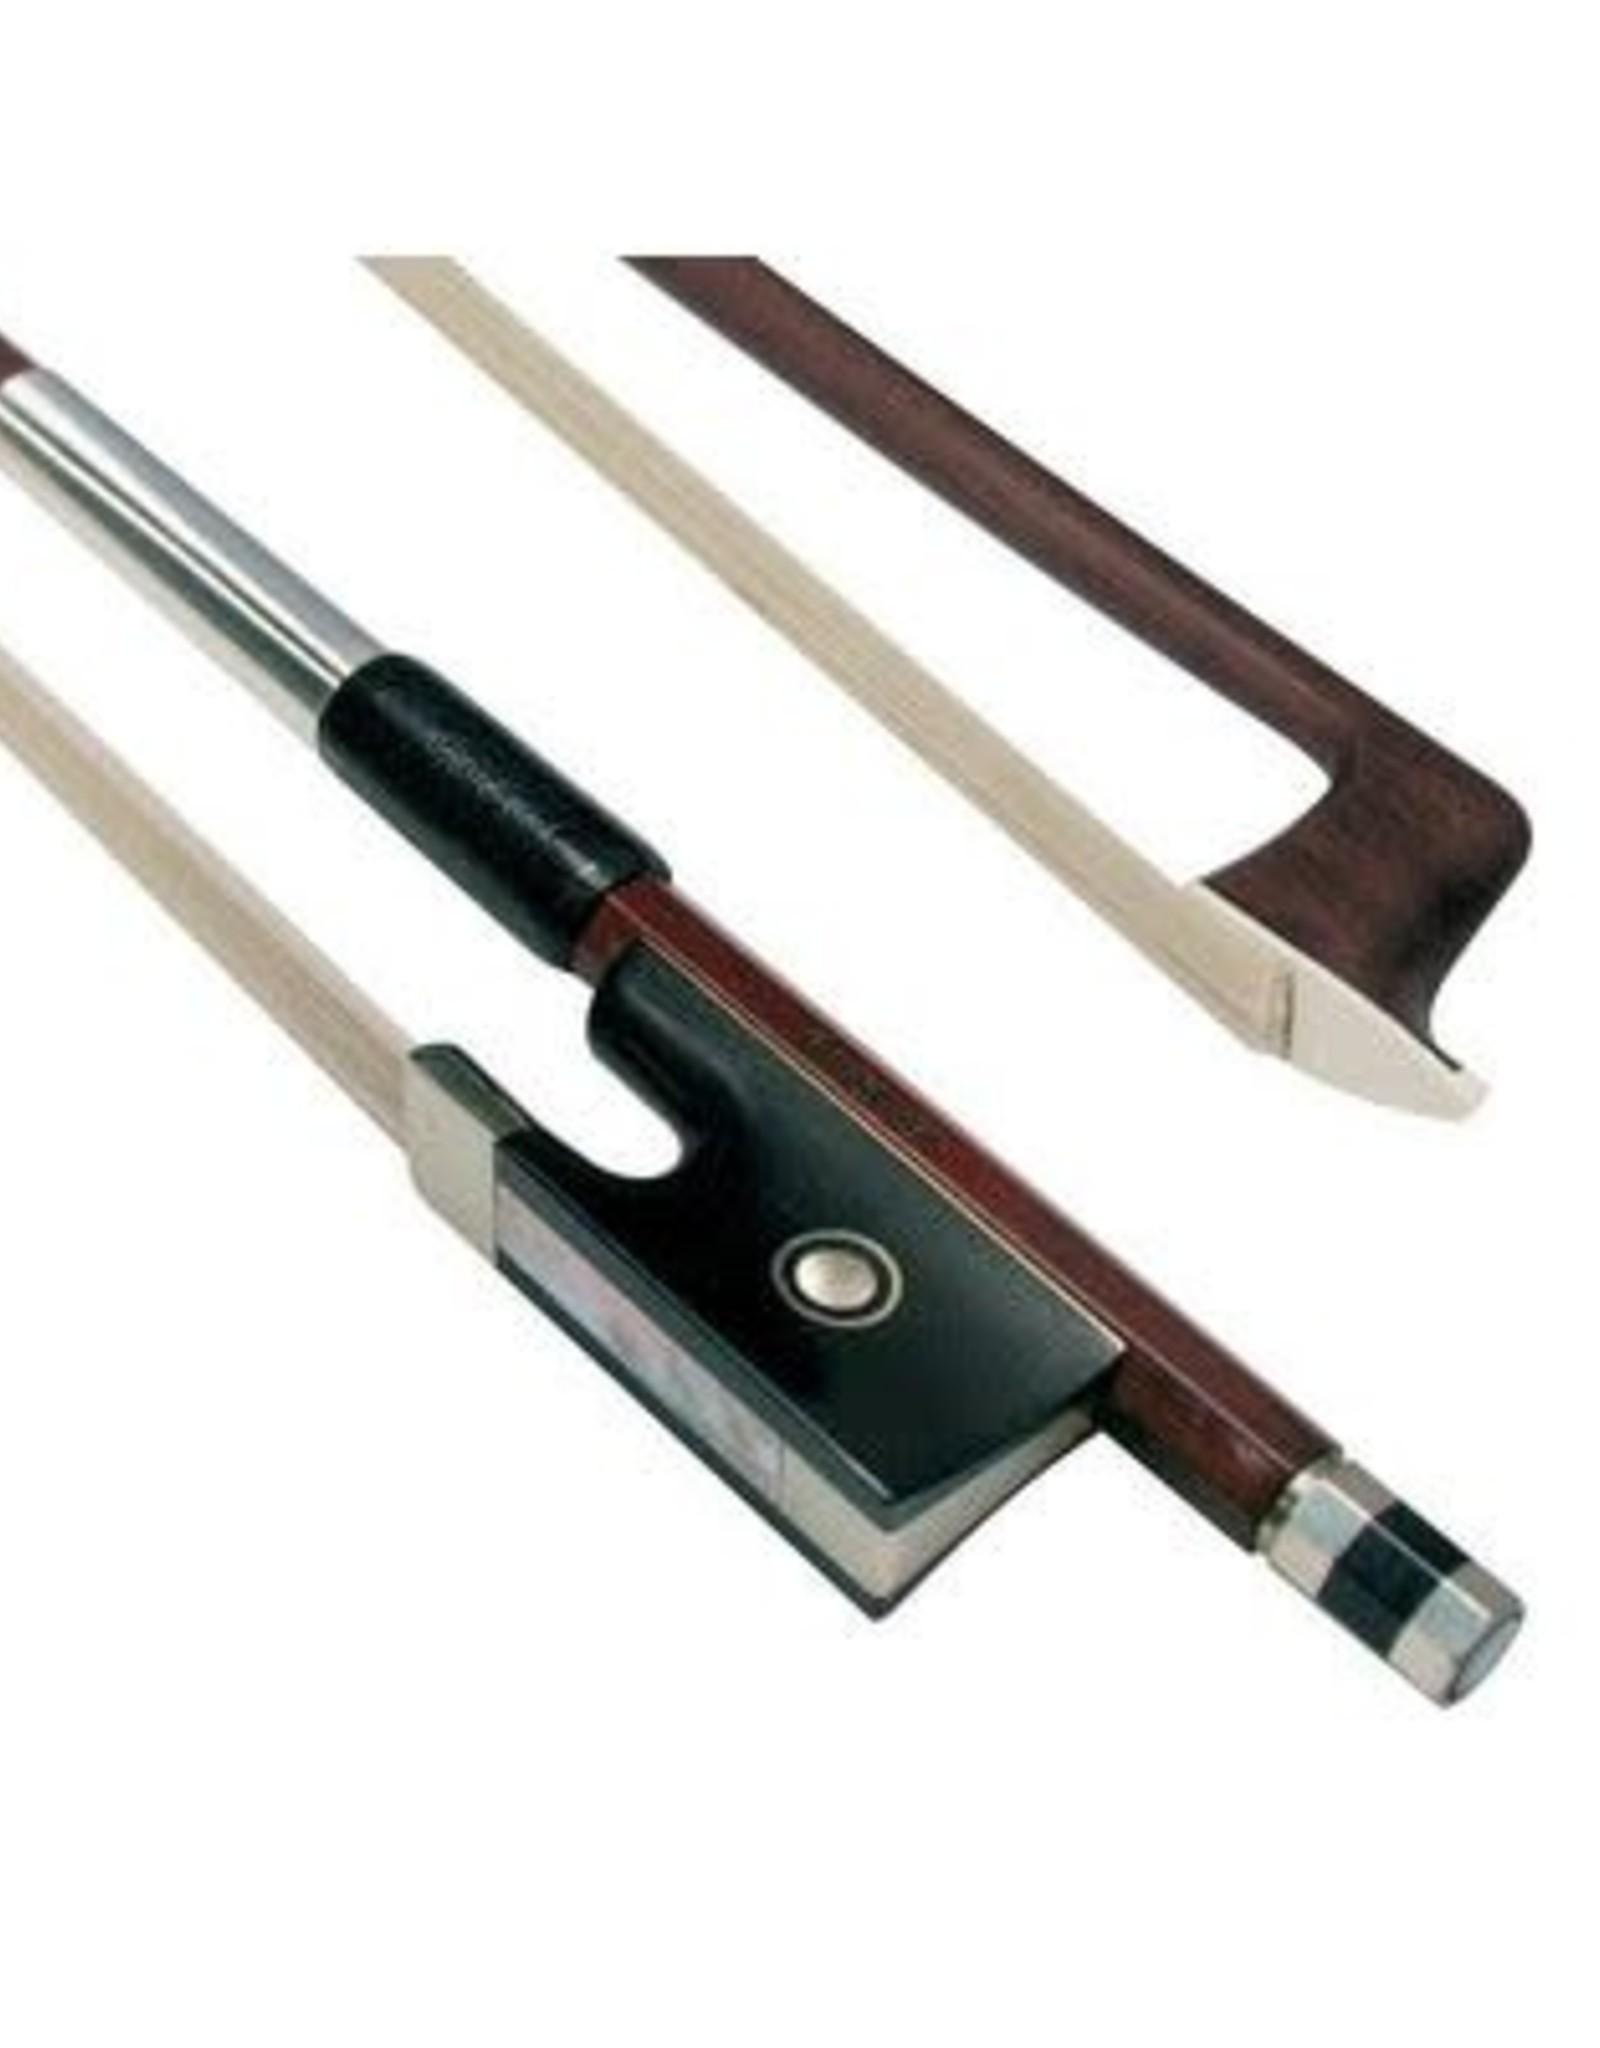 DORFLER strijkstok viool, 4/4, pernambuco, rond